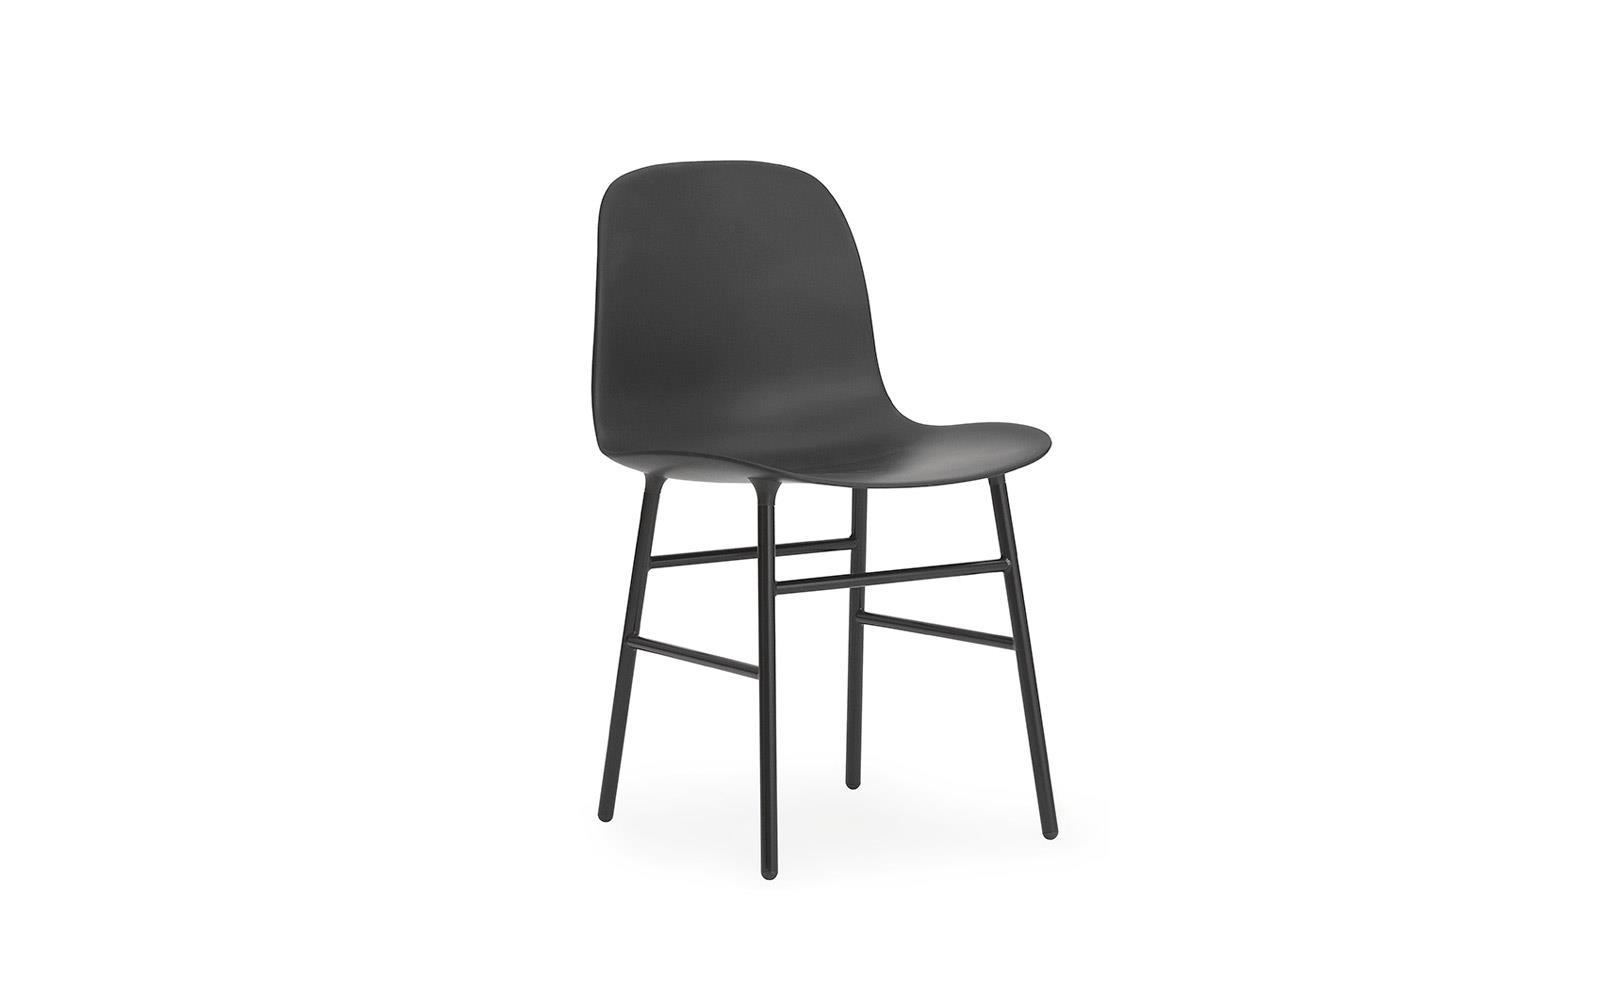 chair steel legs bedroom vanity form molded plastic shell with steel1